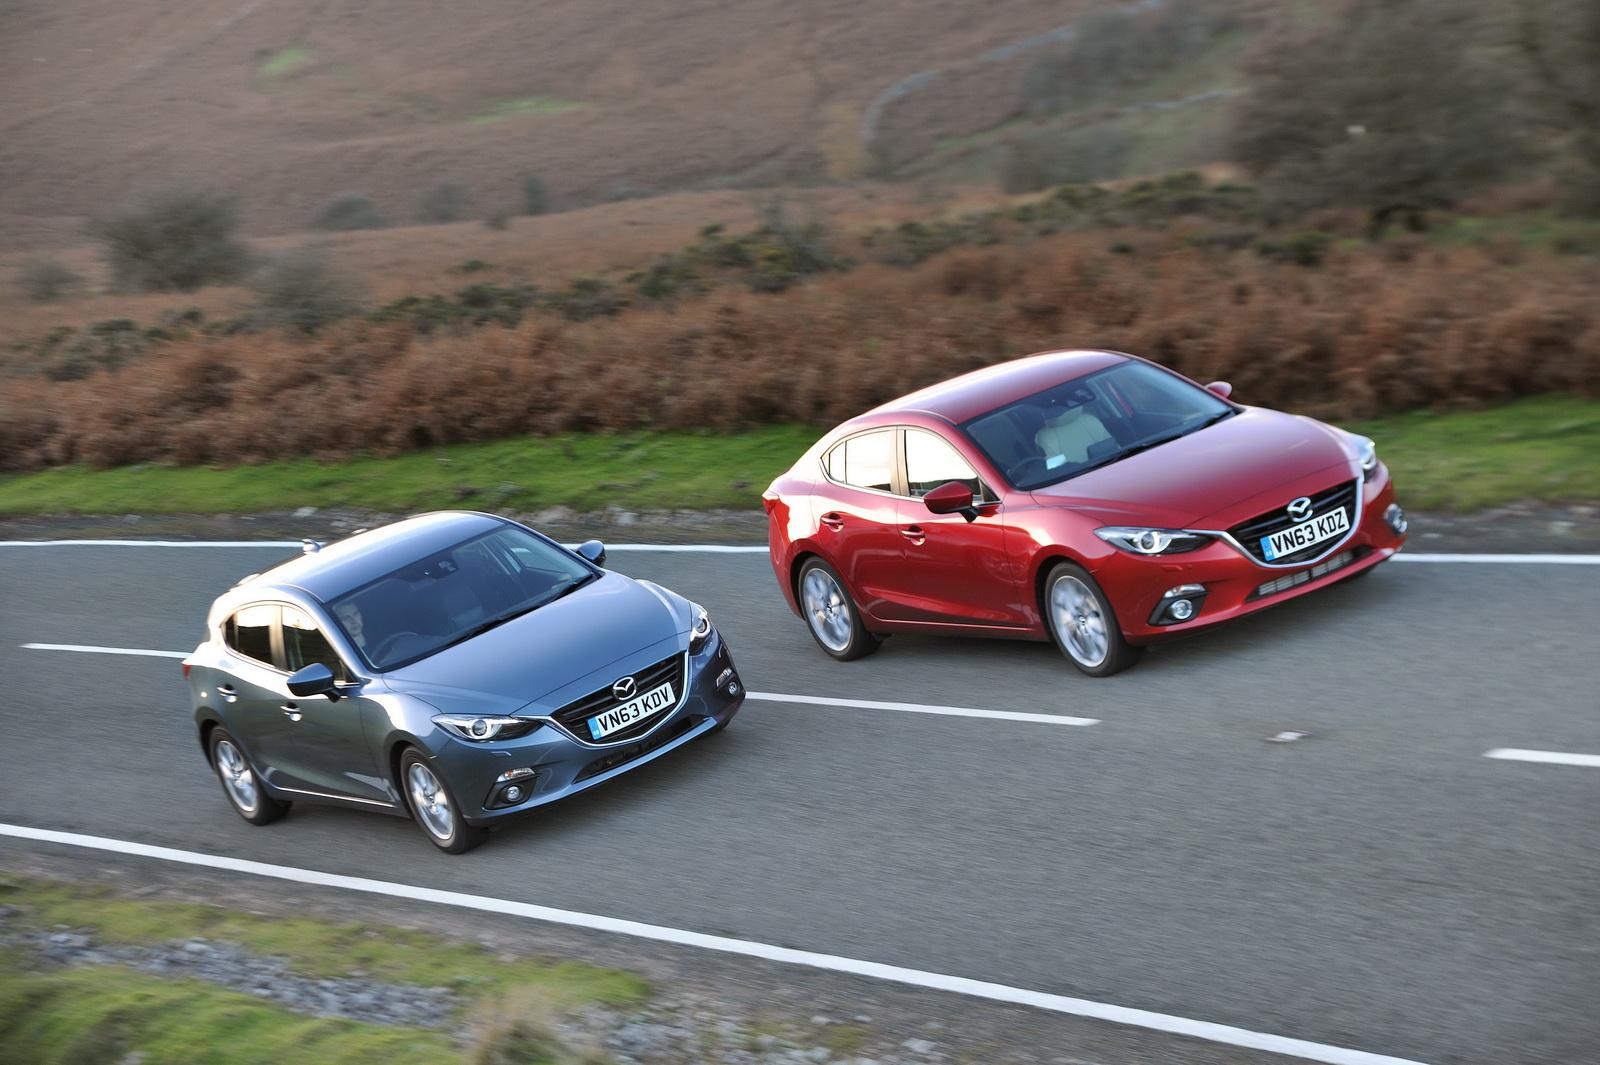 2016 Mazda 3 1.5 Dizel Resim Galerisi